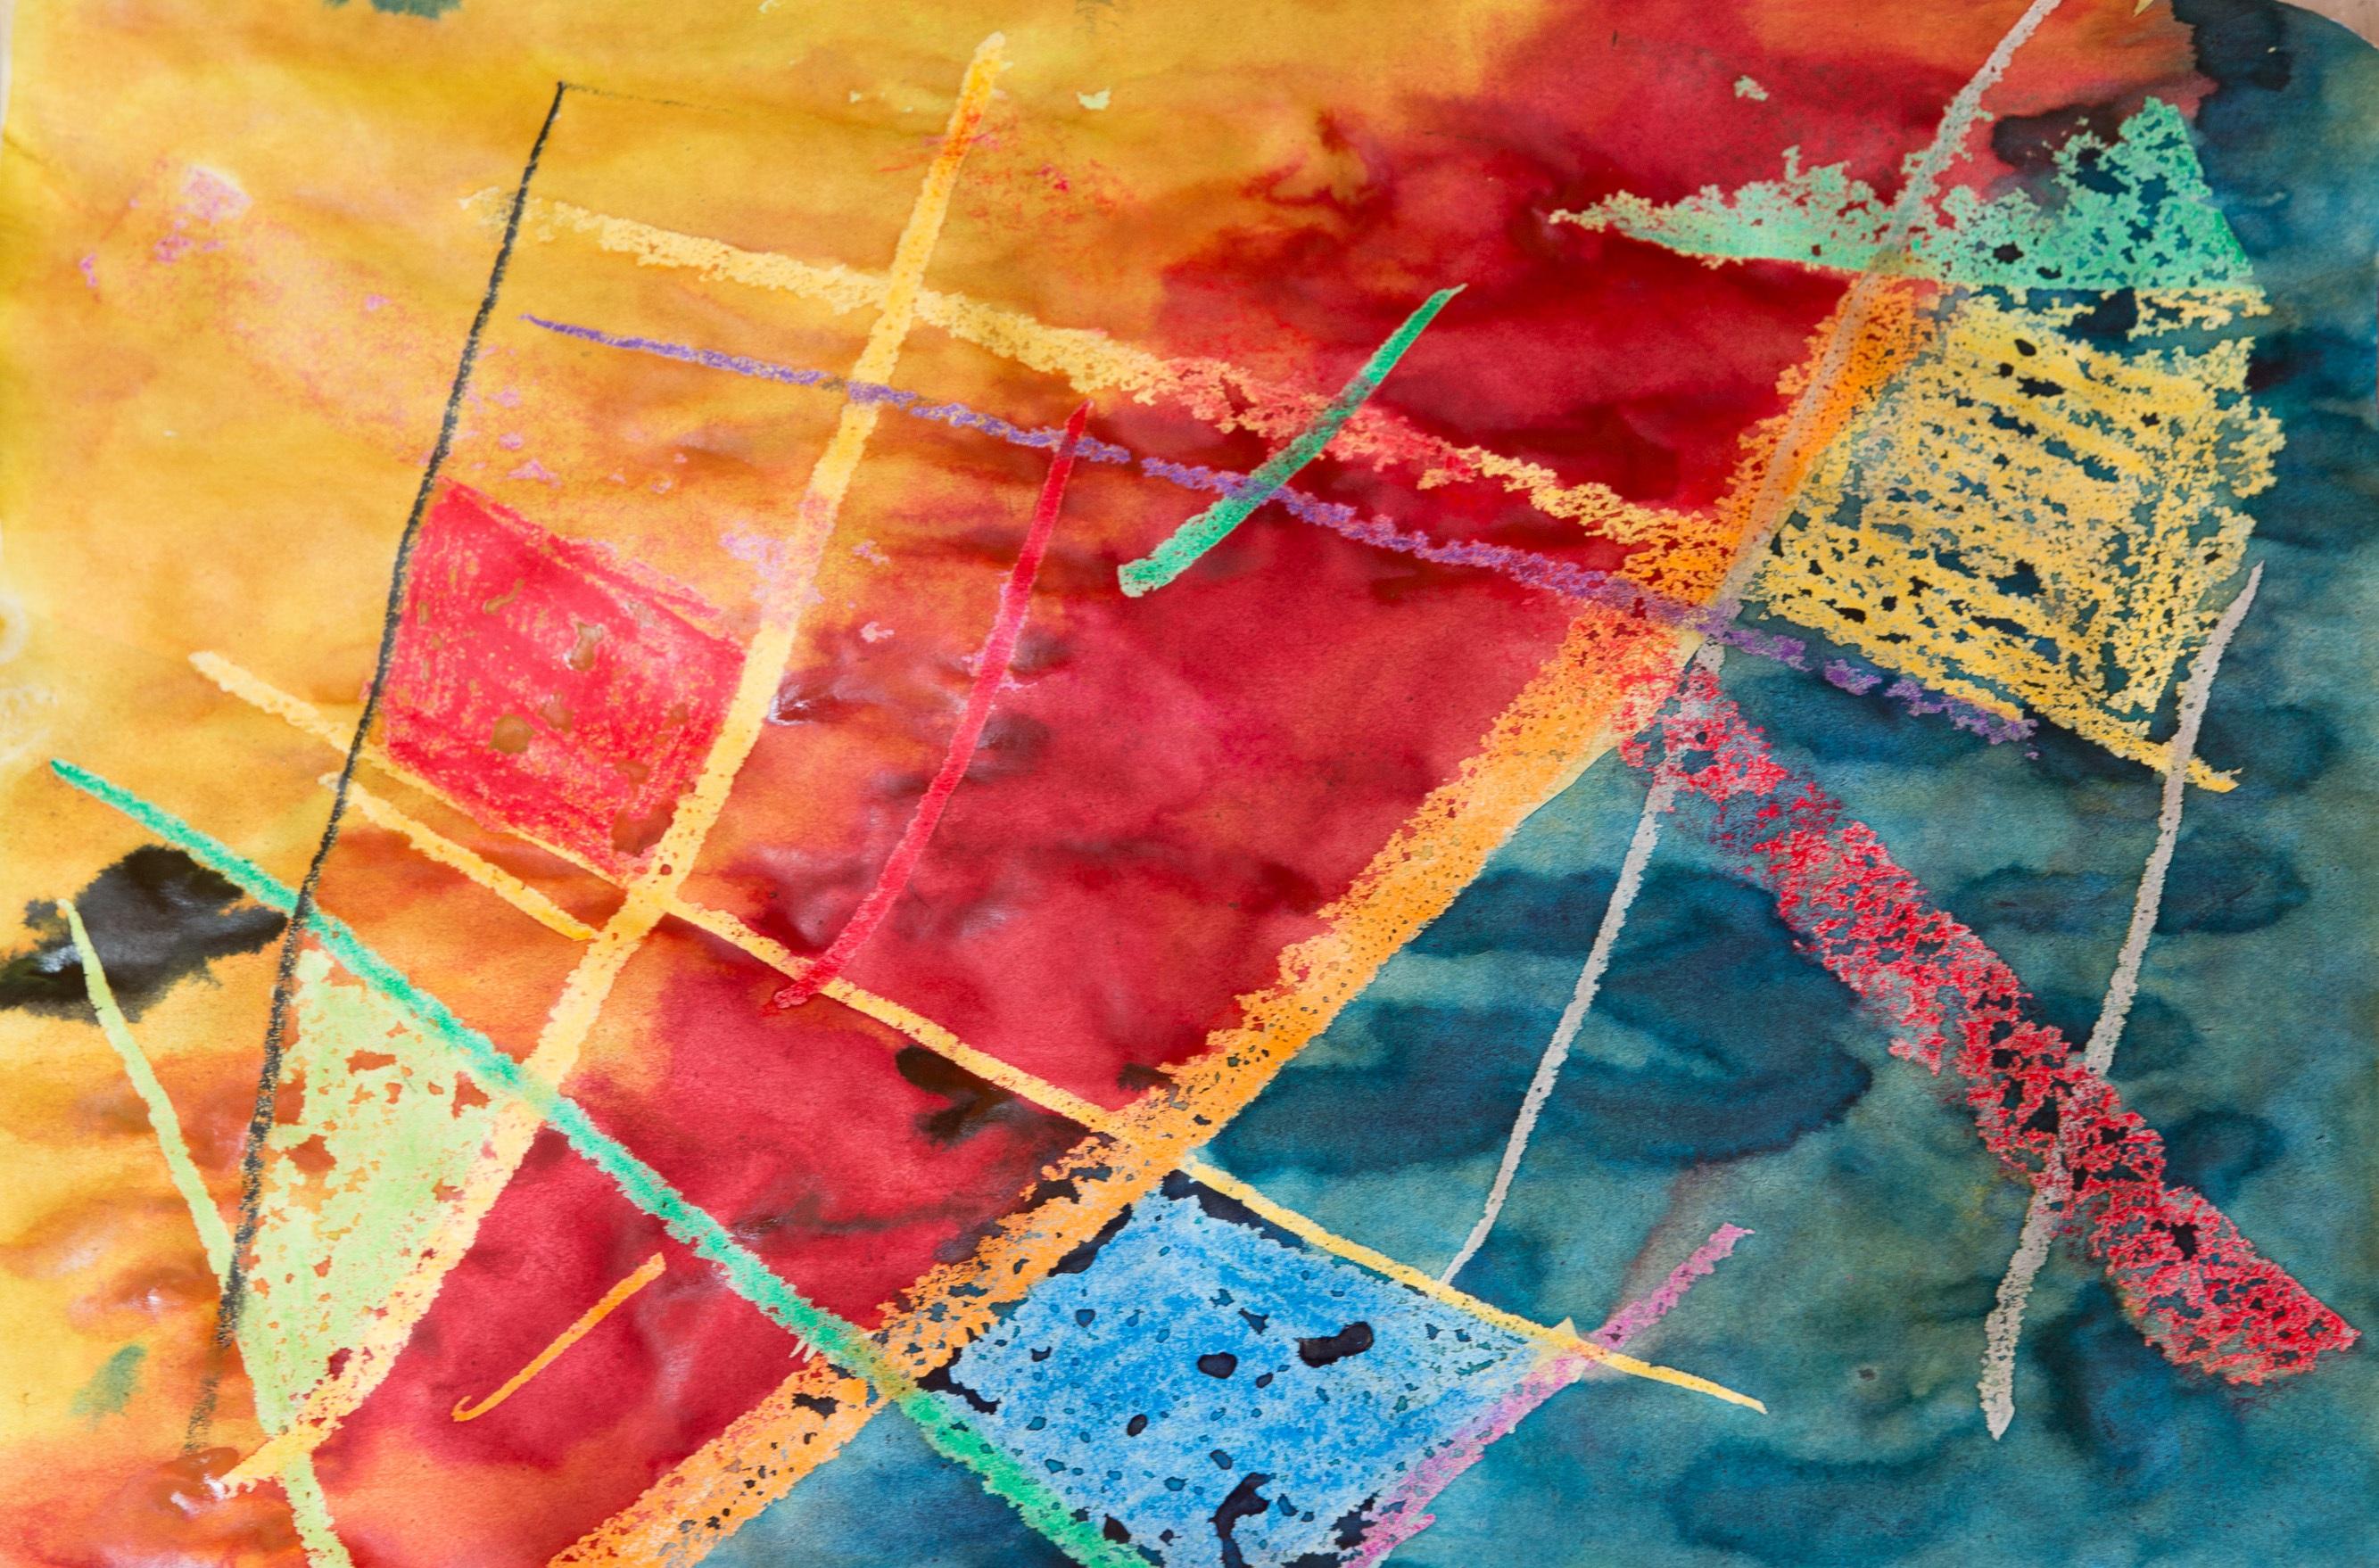 Gambar Abstrak Struktur Pola Merah Biru Warna Warni Kuning